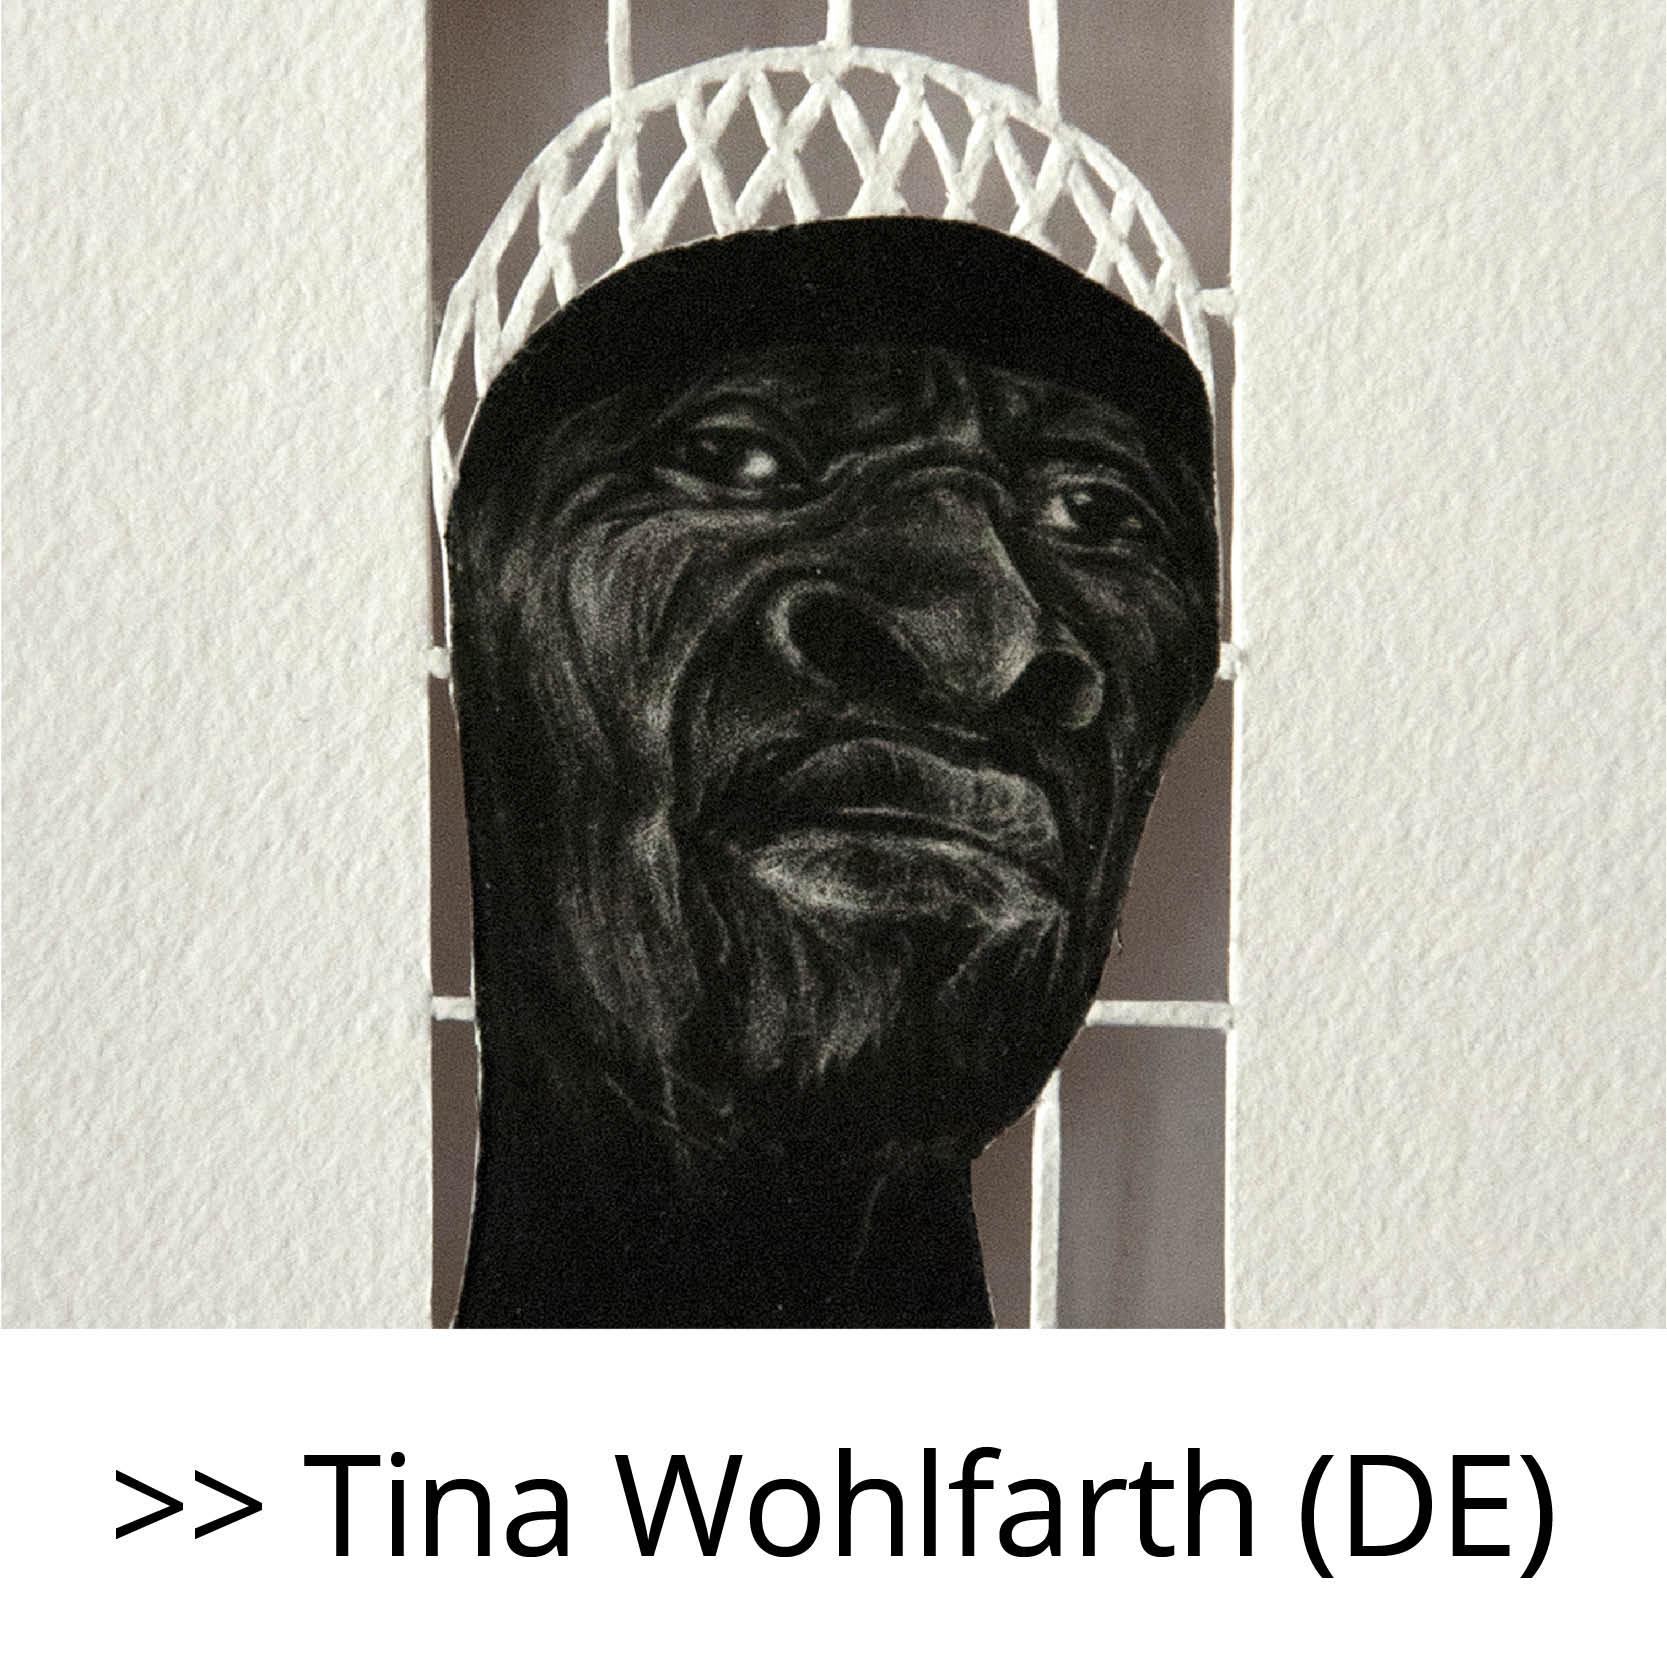 Tina_Wohlfarth_(DE)